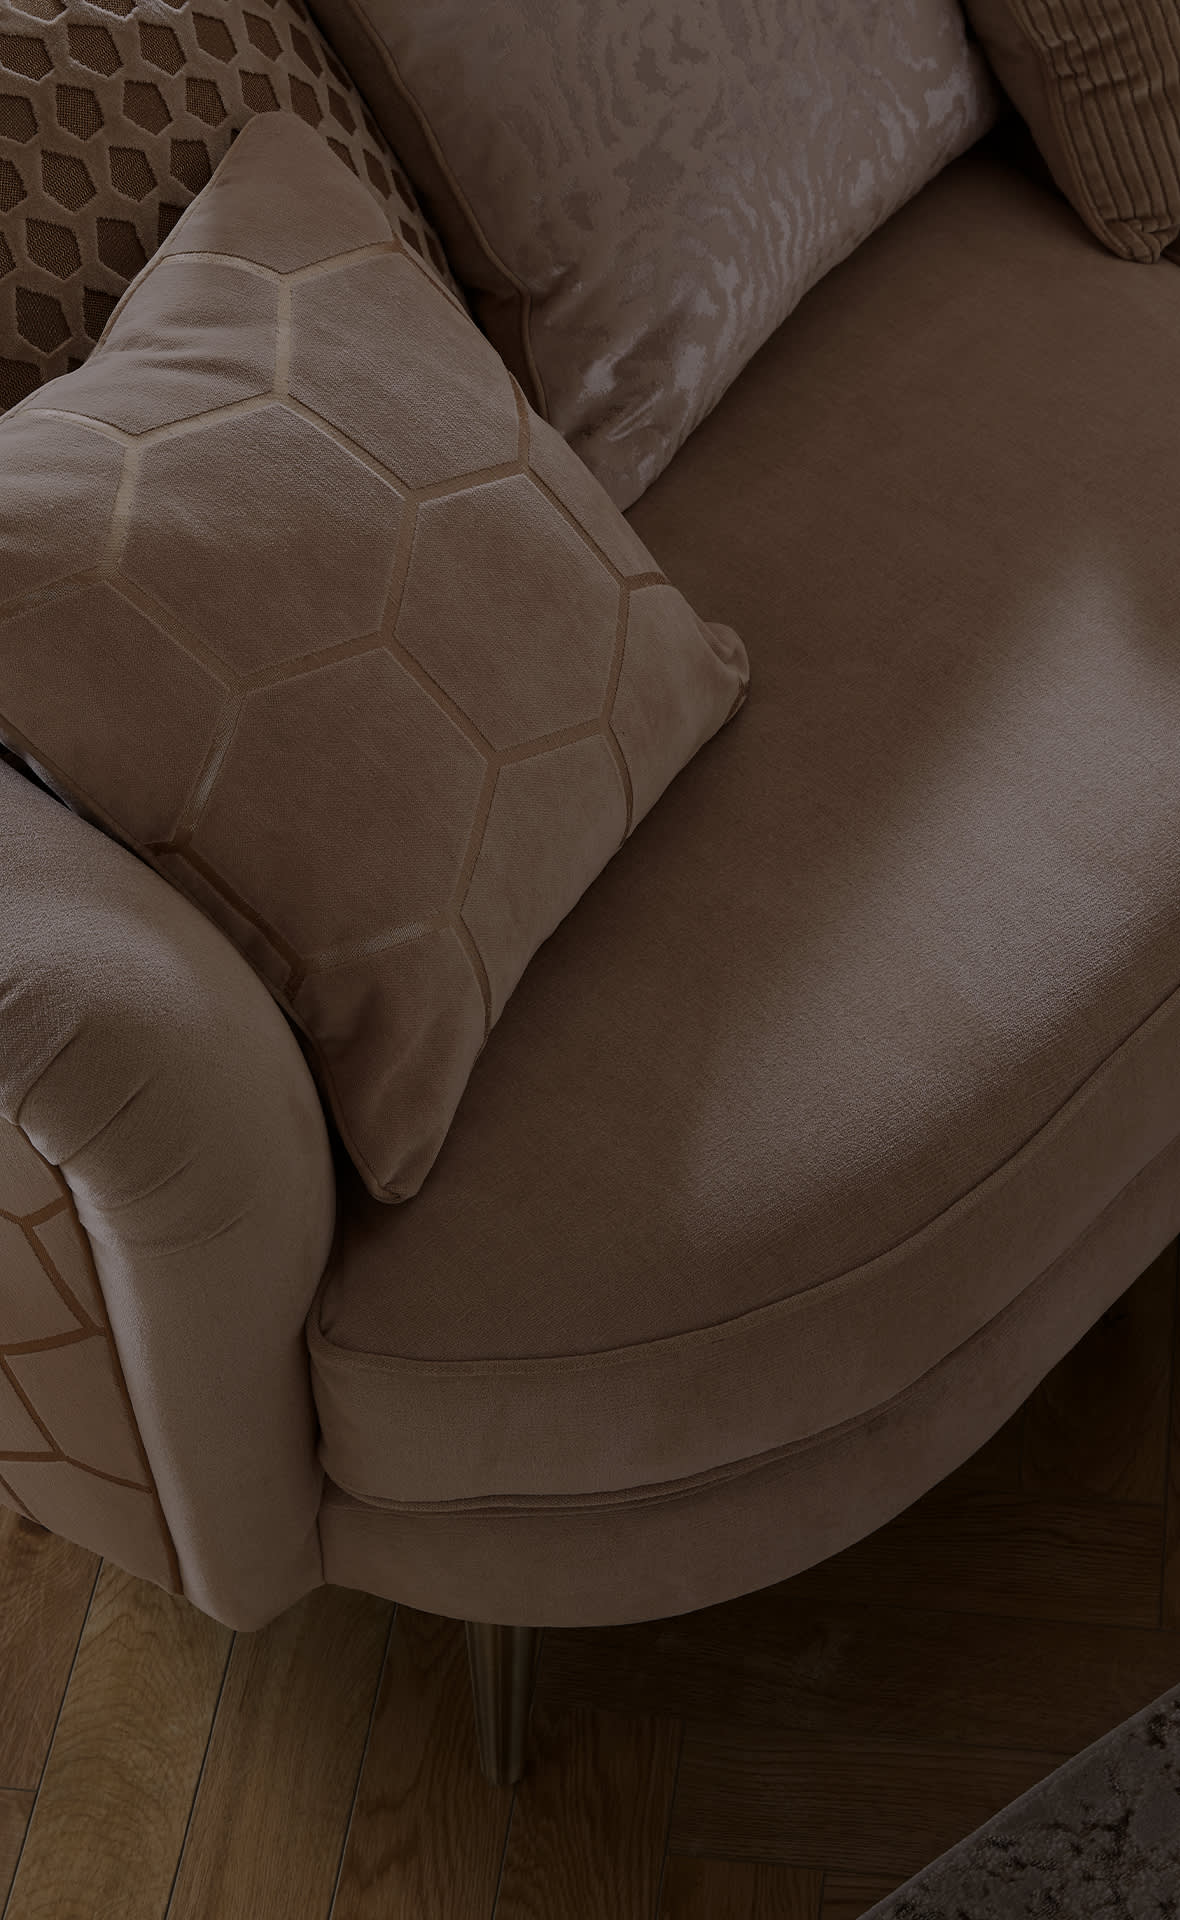 Sofology Honeycomb corner sofa